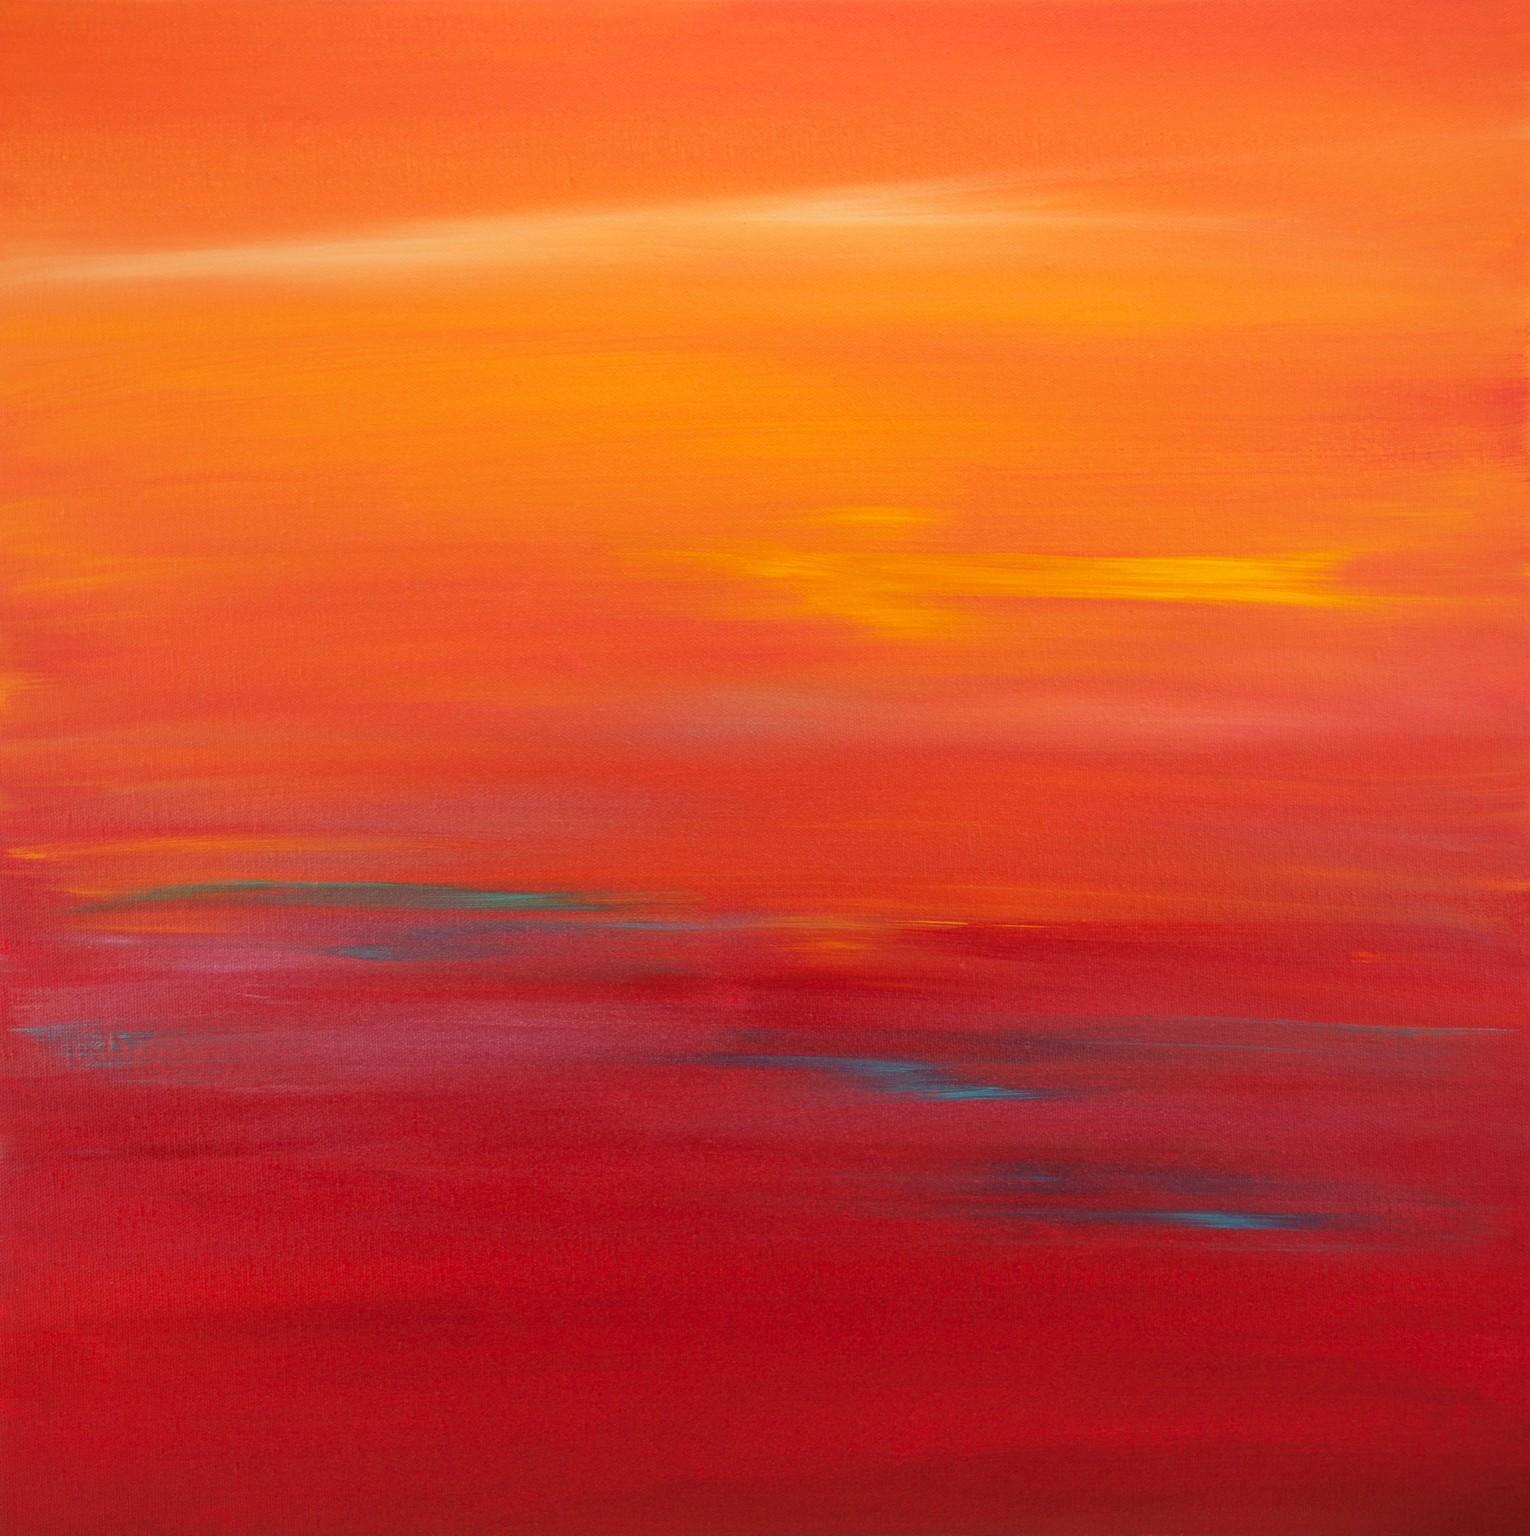 Sunset 58 by Hilary Winfield - Vango Original Art